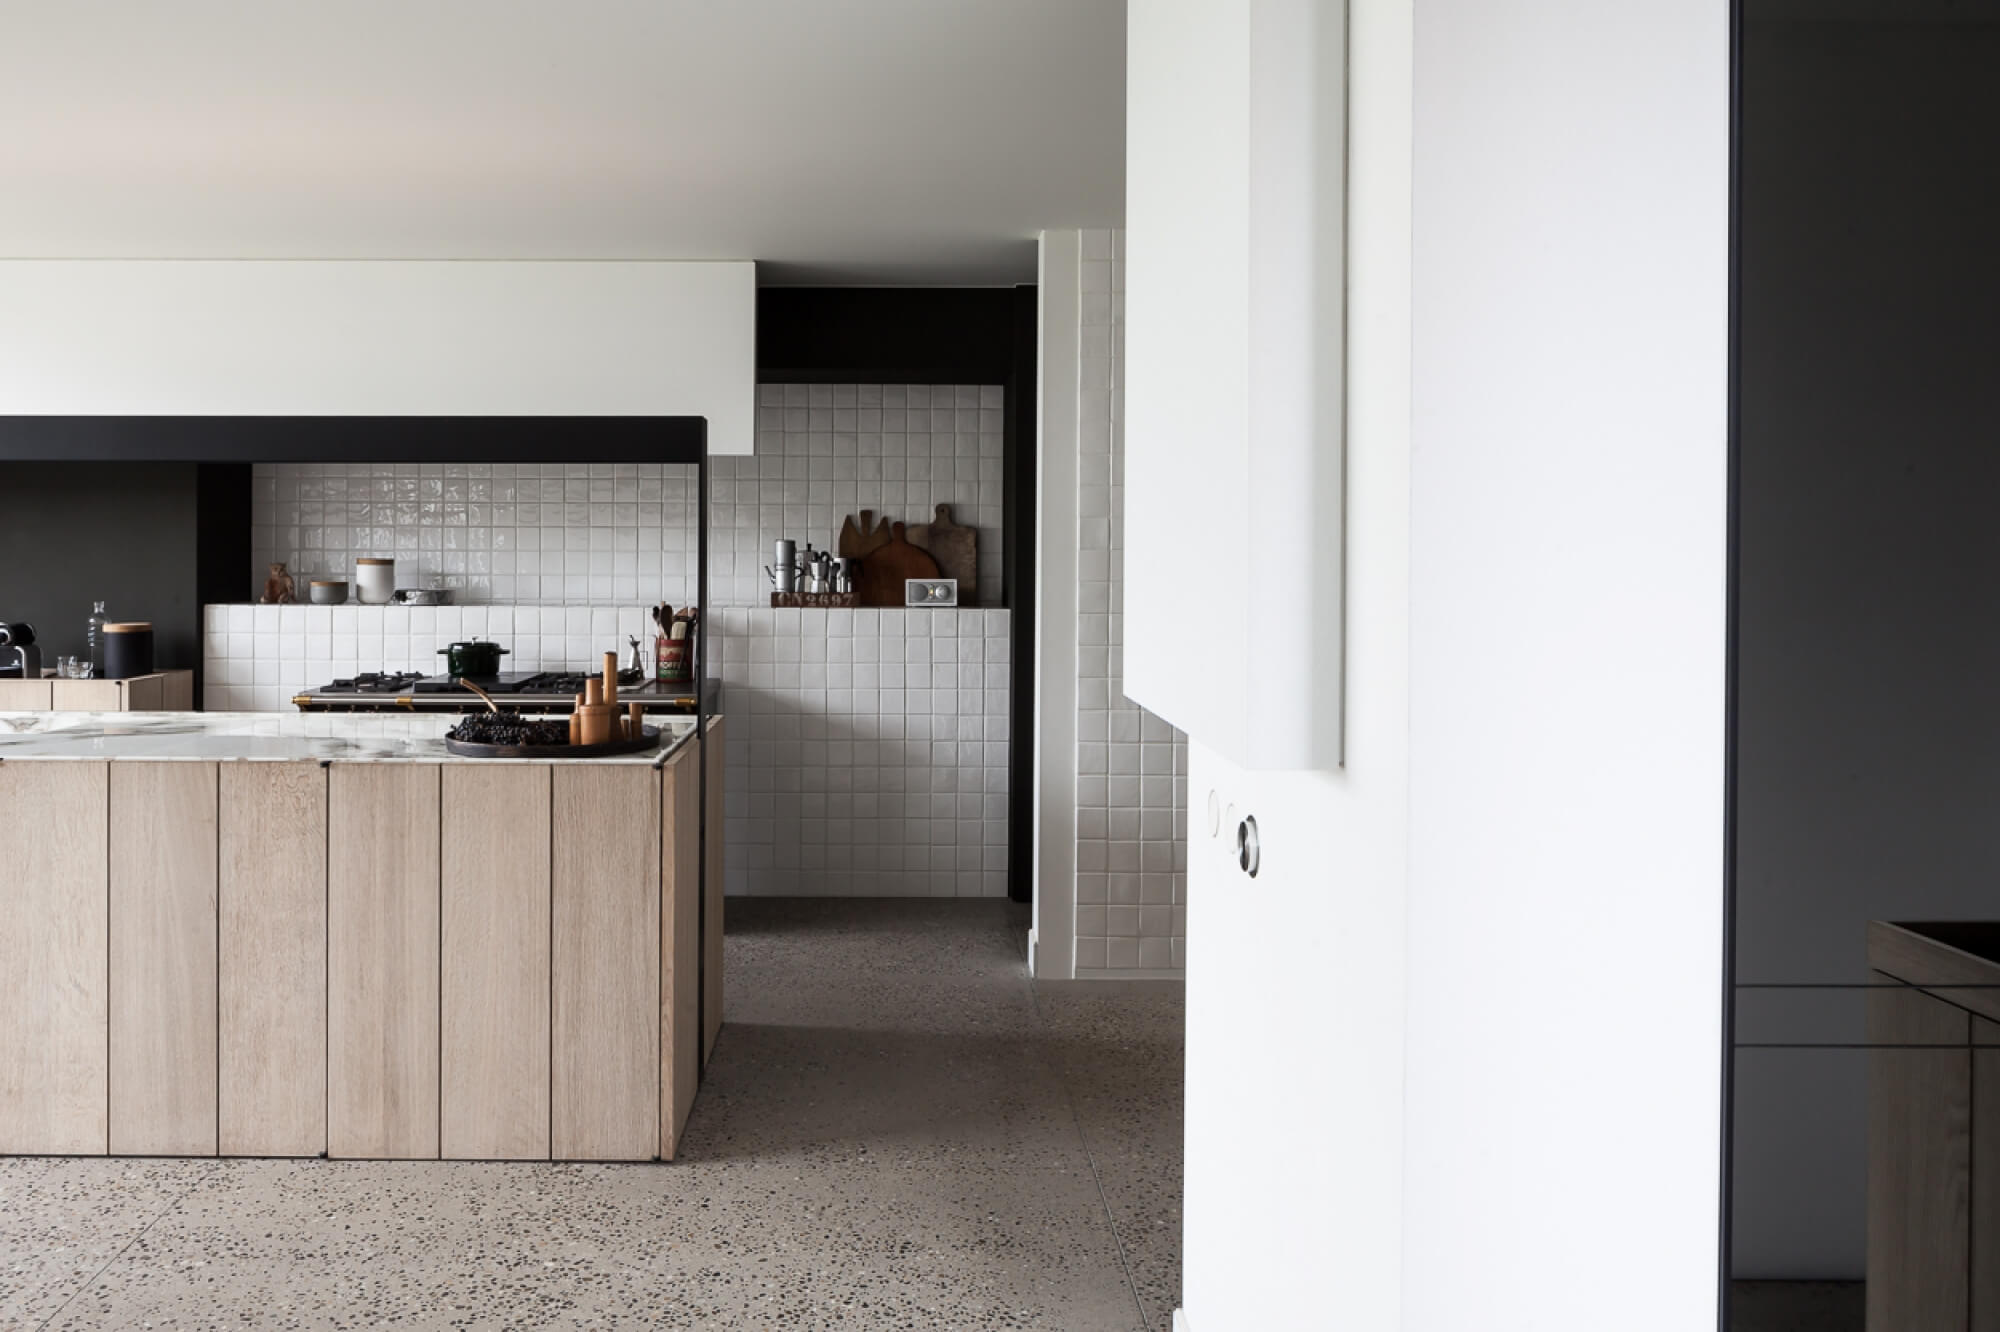 du carrelage blanc dans la cuisine frenchy fancy. Black Bedroom Furniture Sets. Home Design Ideas